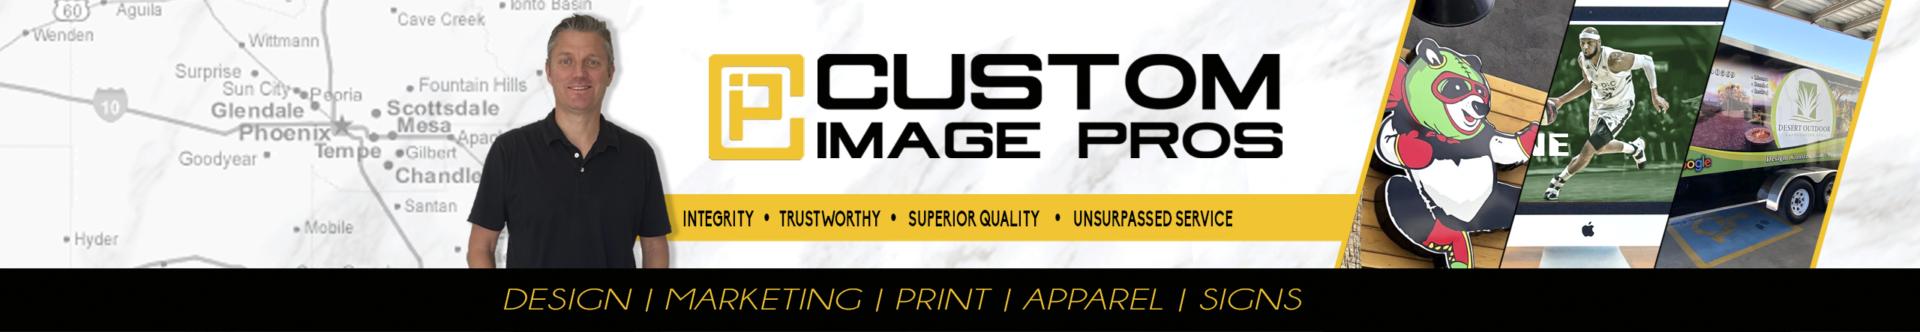 Custom_Image_Pros_site_Header